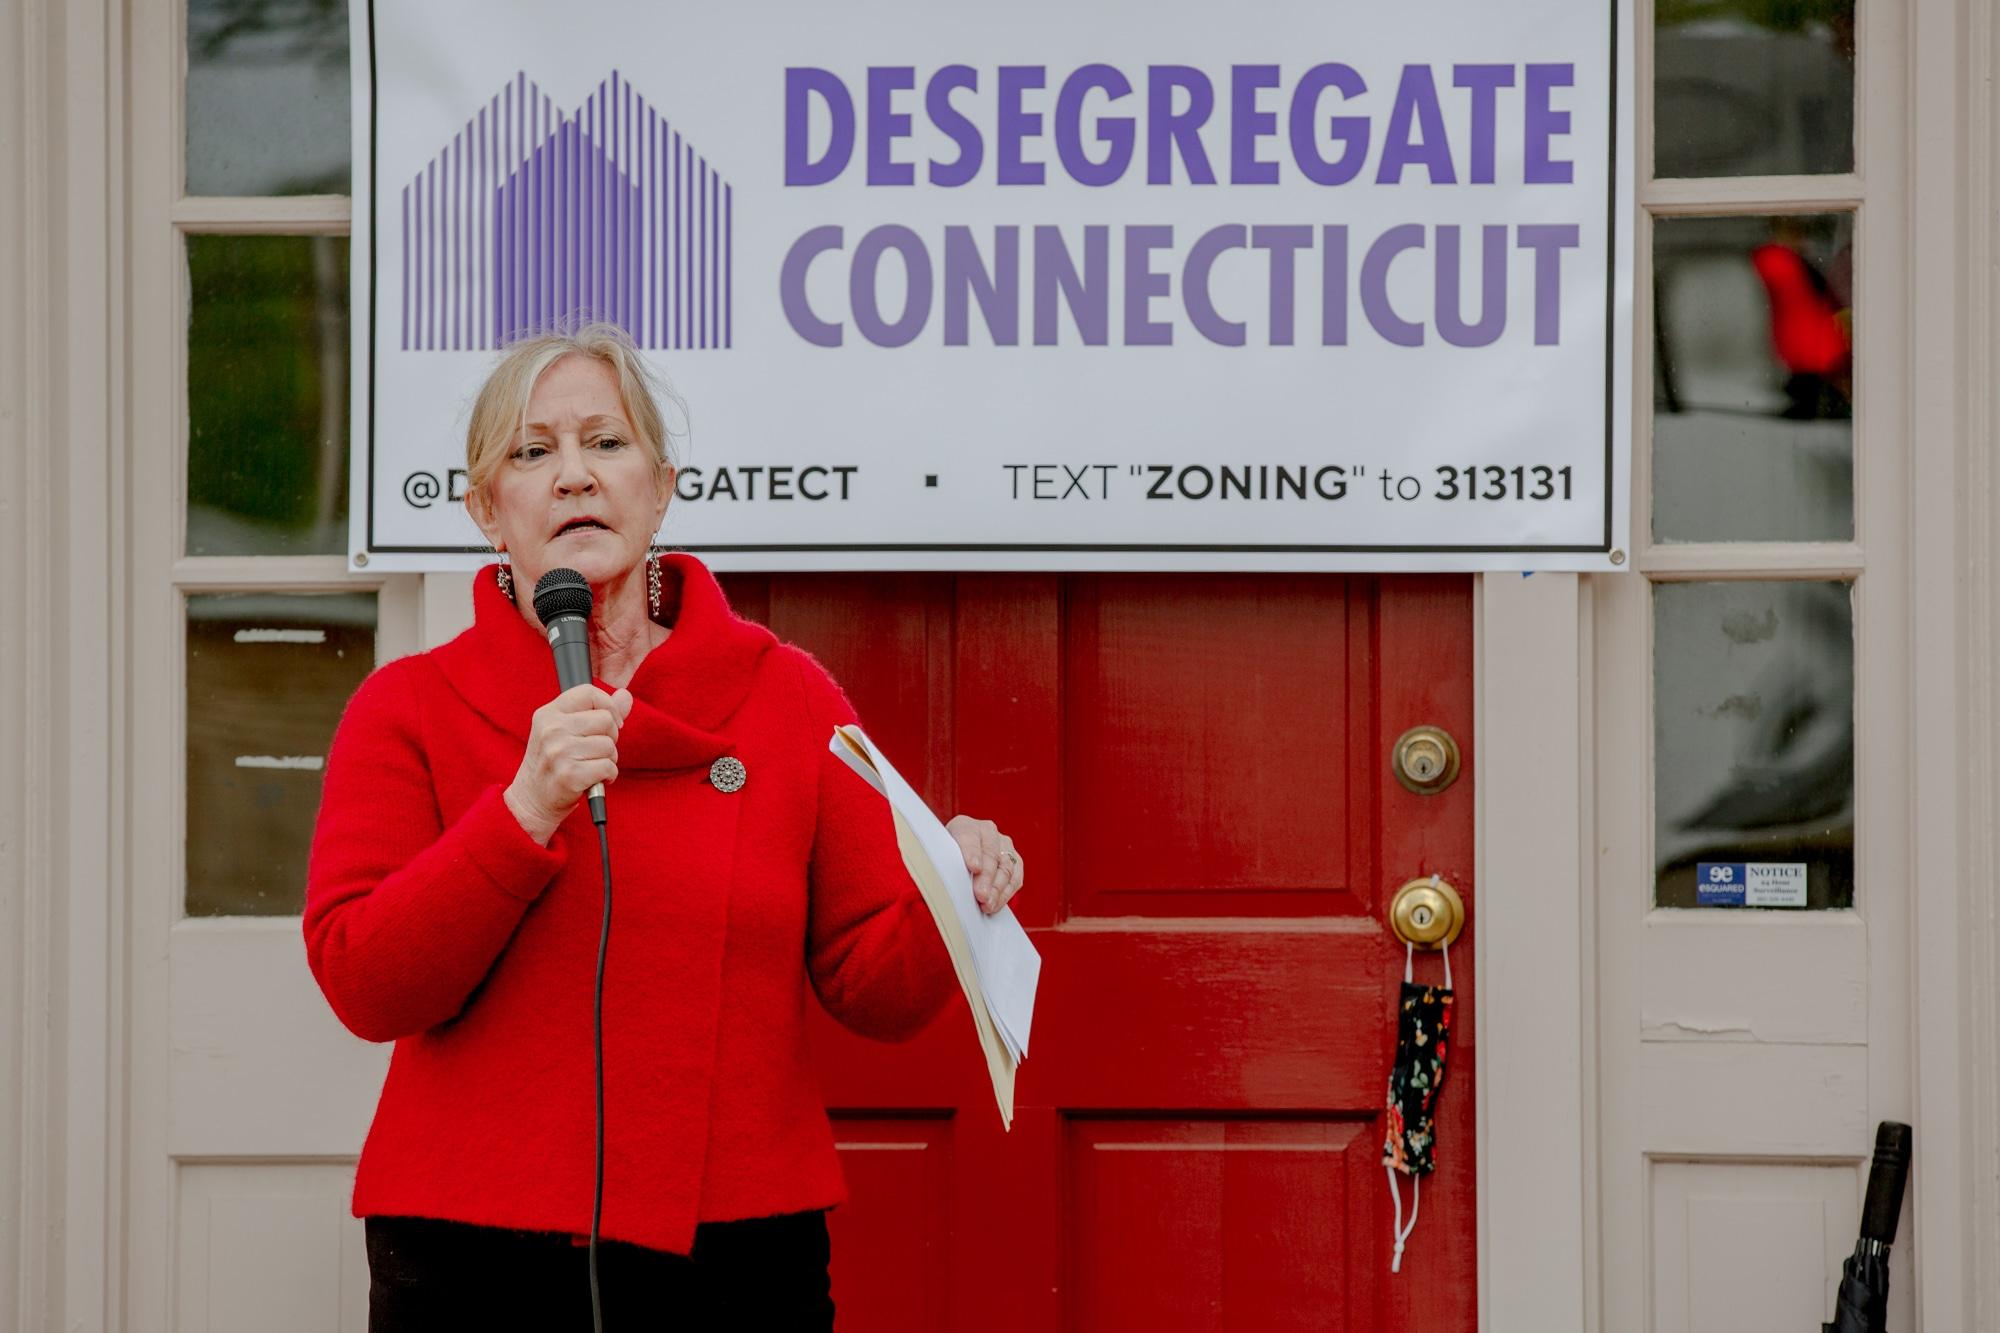 Senate passes controversial zoning reform bill